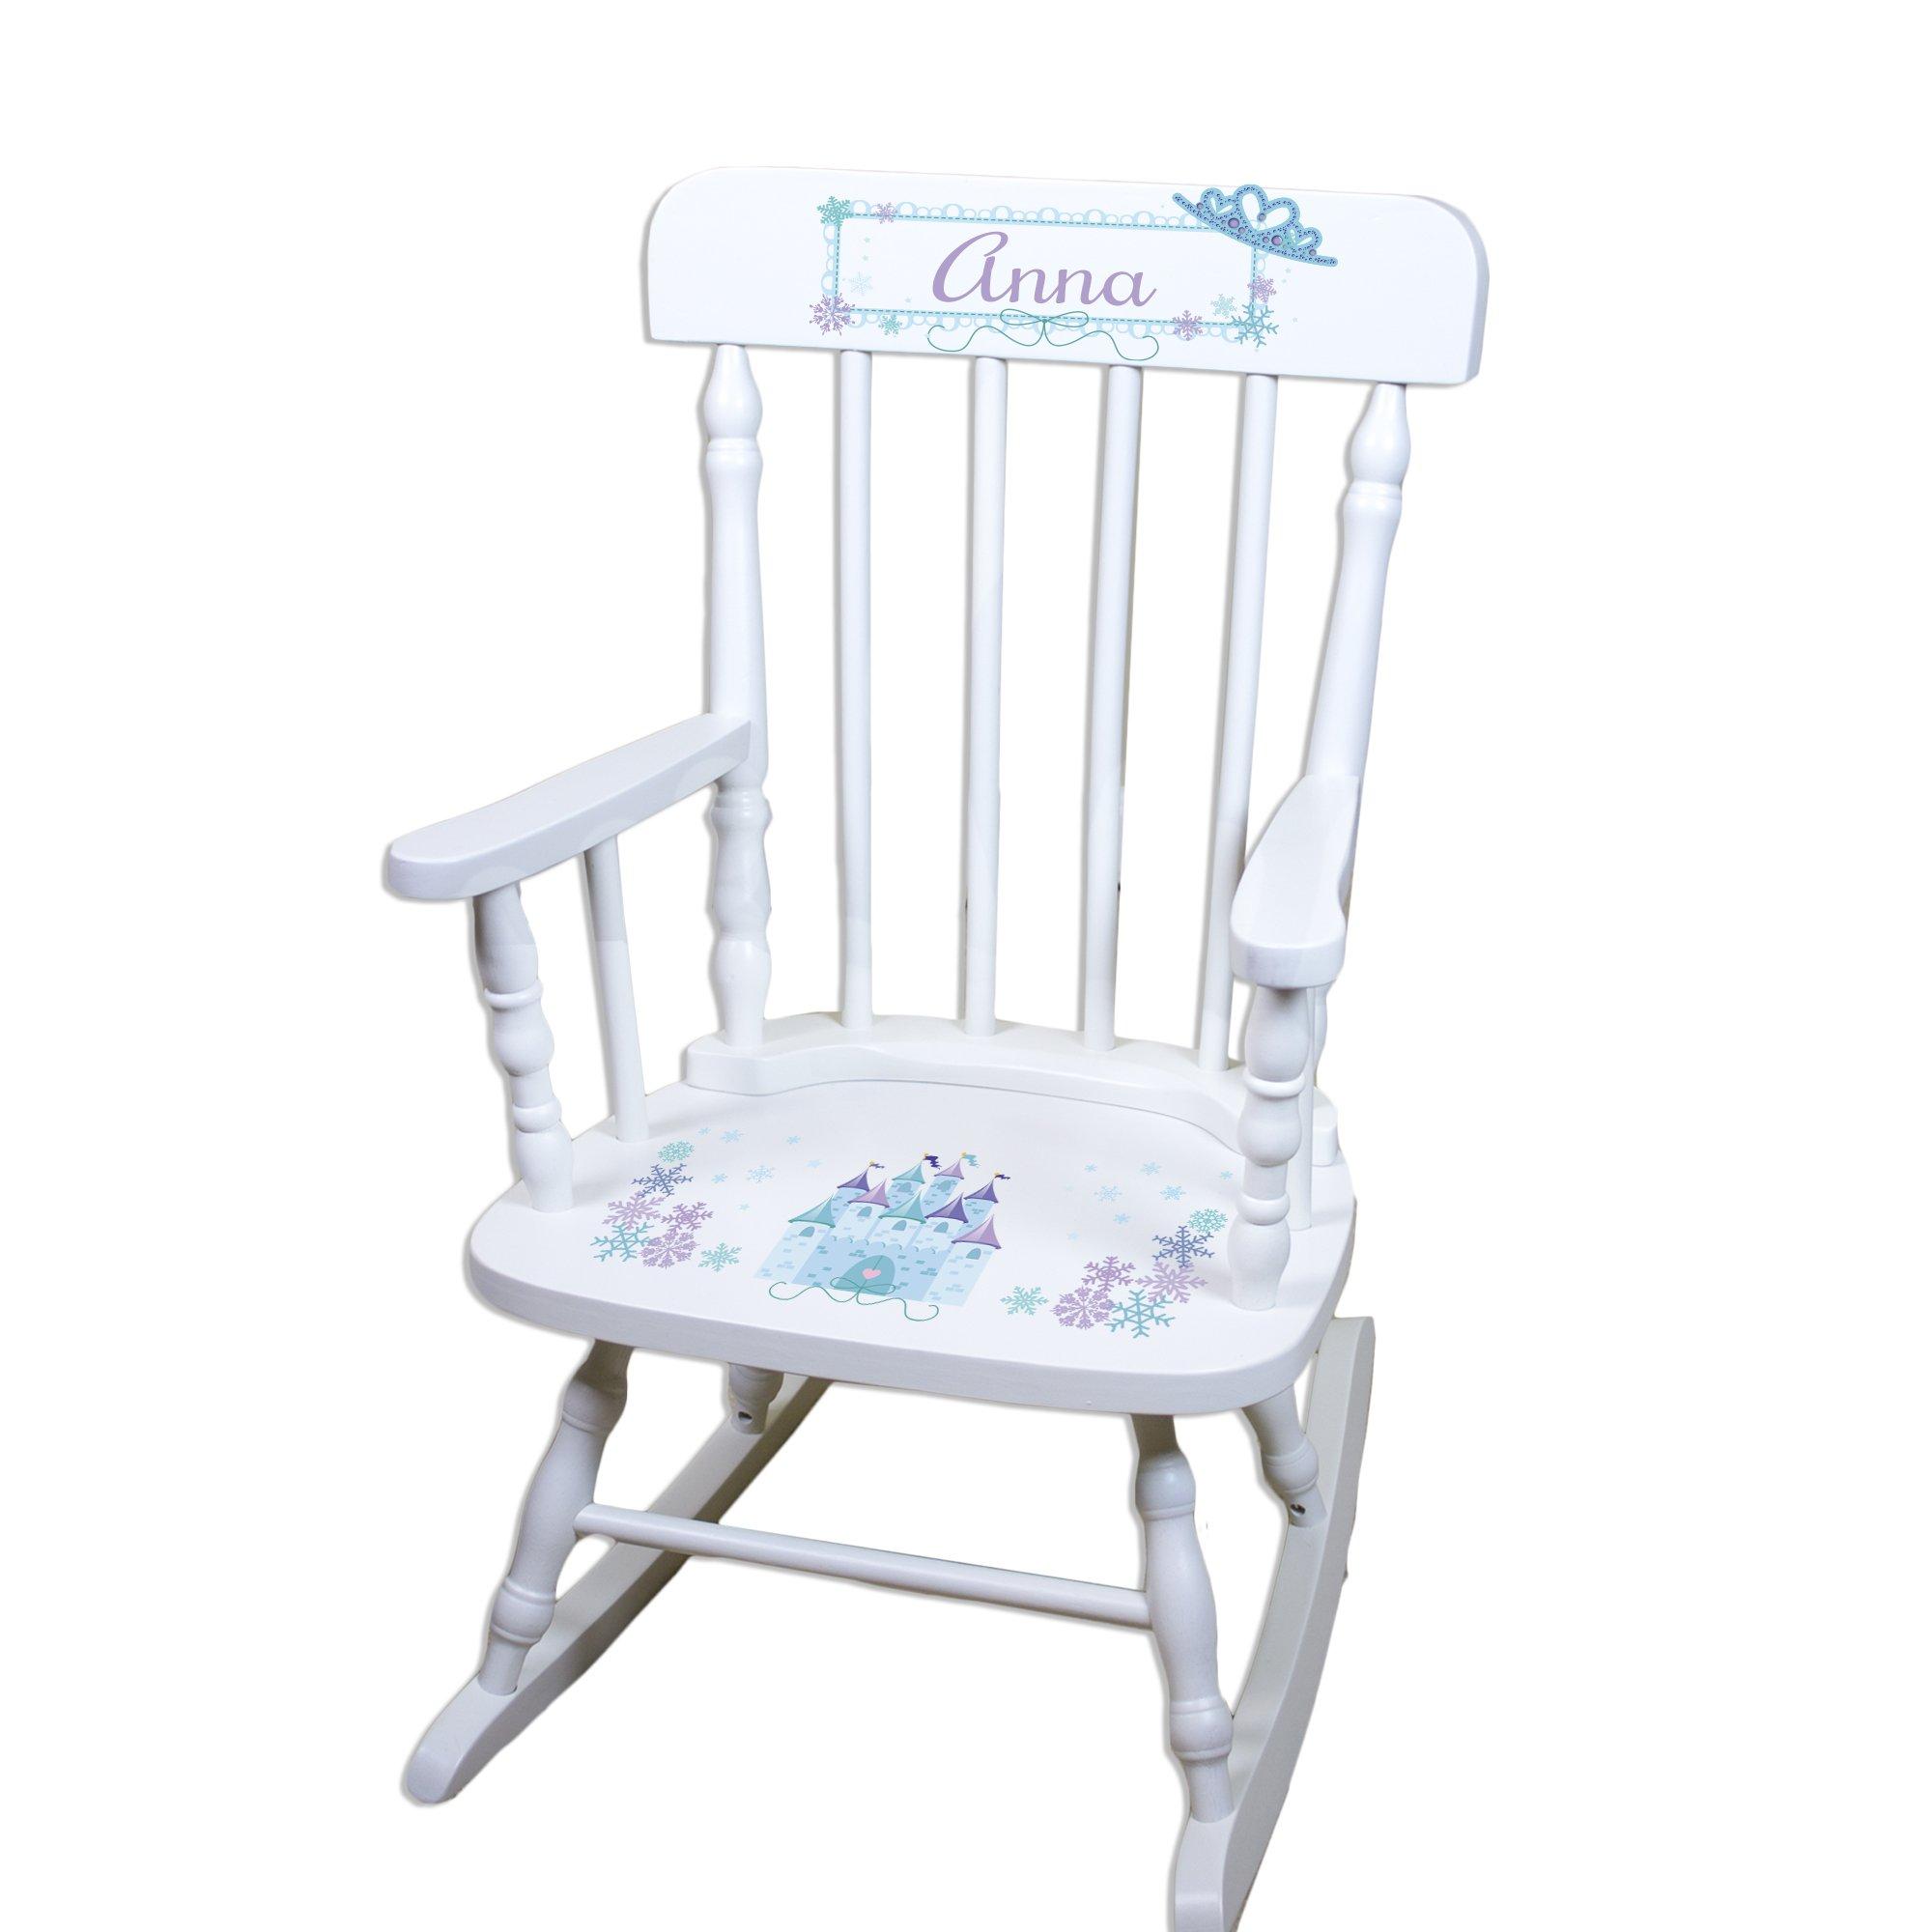 Children's Personalized White Ice Princess Rocking Chair by MyBambino (Image #1)